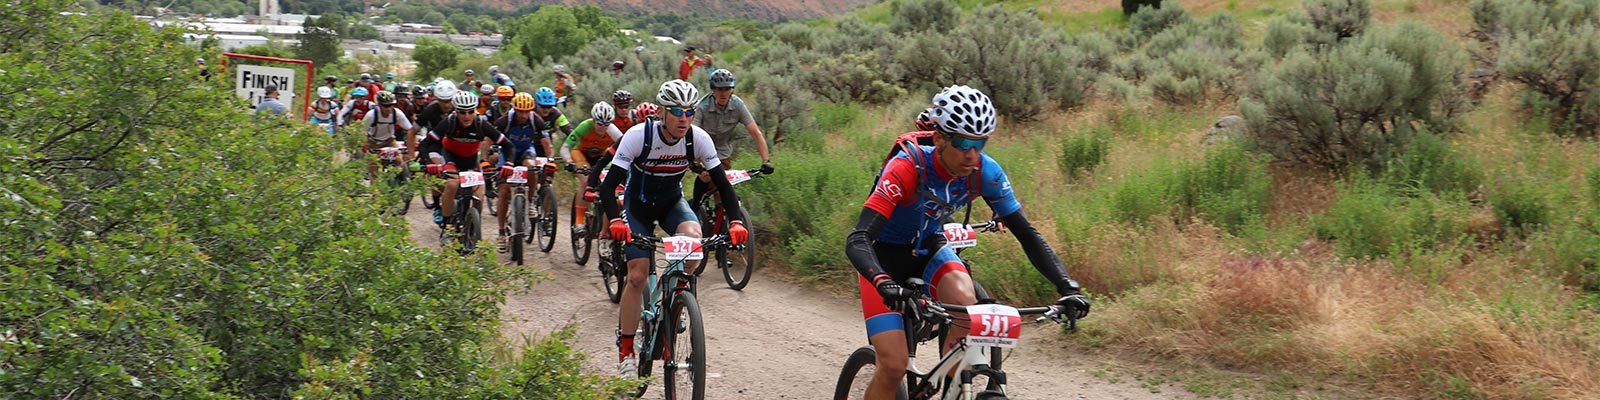 mountain bike race above Pocatello